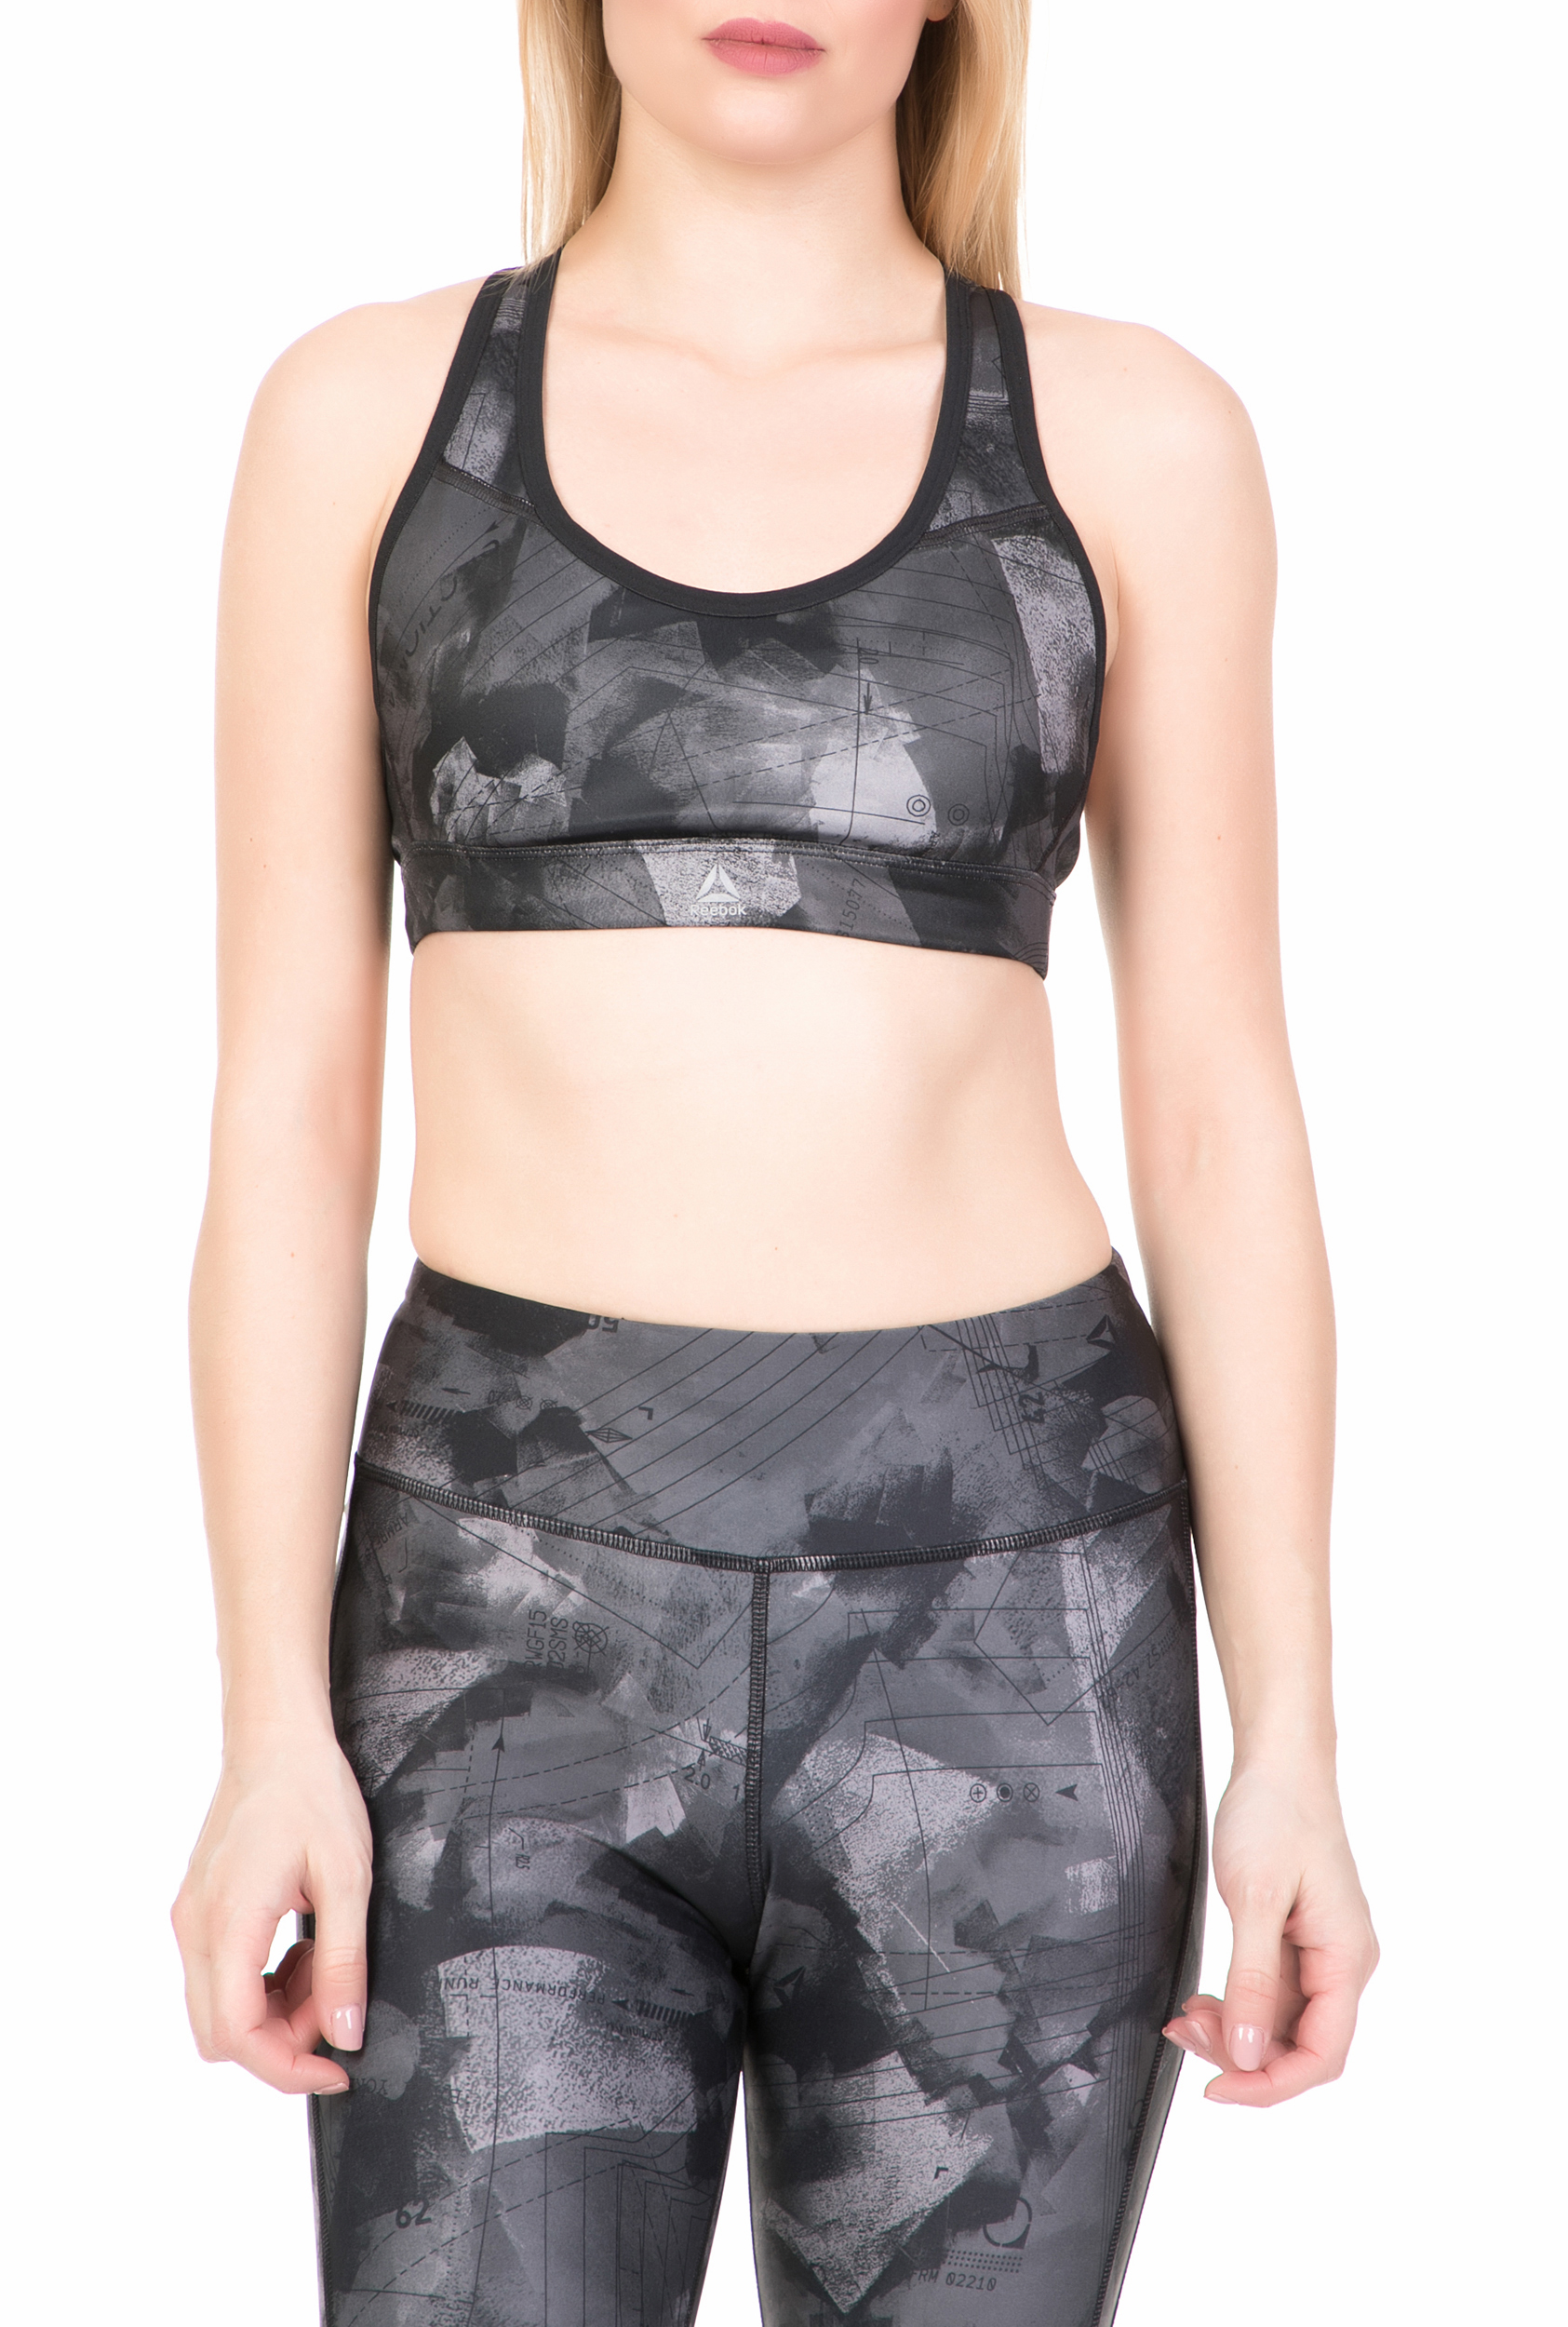 REEBOK - Γυναικείο αθλητικό μπουστάκι RUN BRA 1 PADDED REEBOK μαύρο